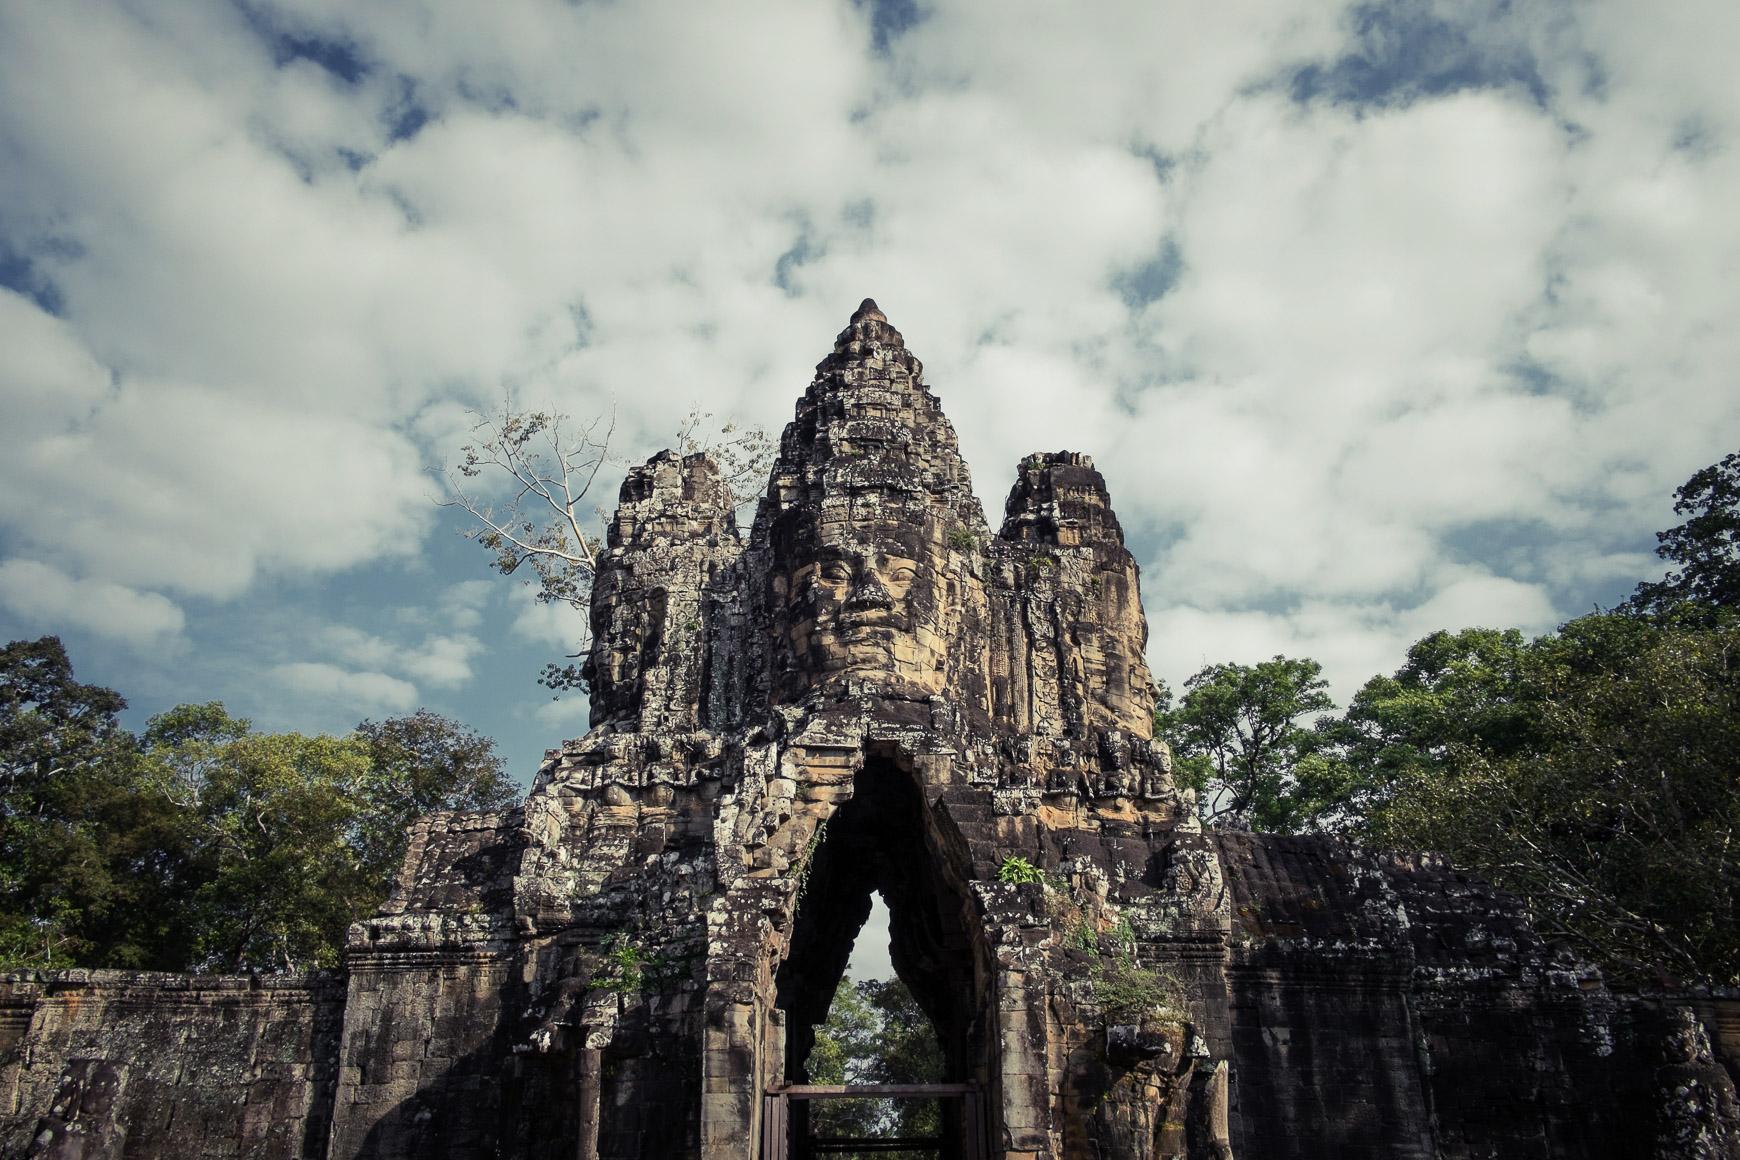 Ankor_Entrance.jpg